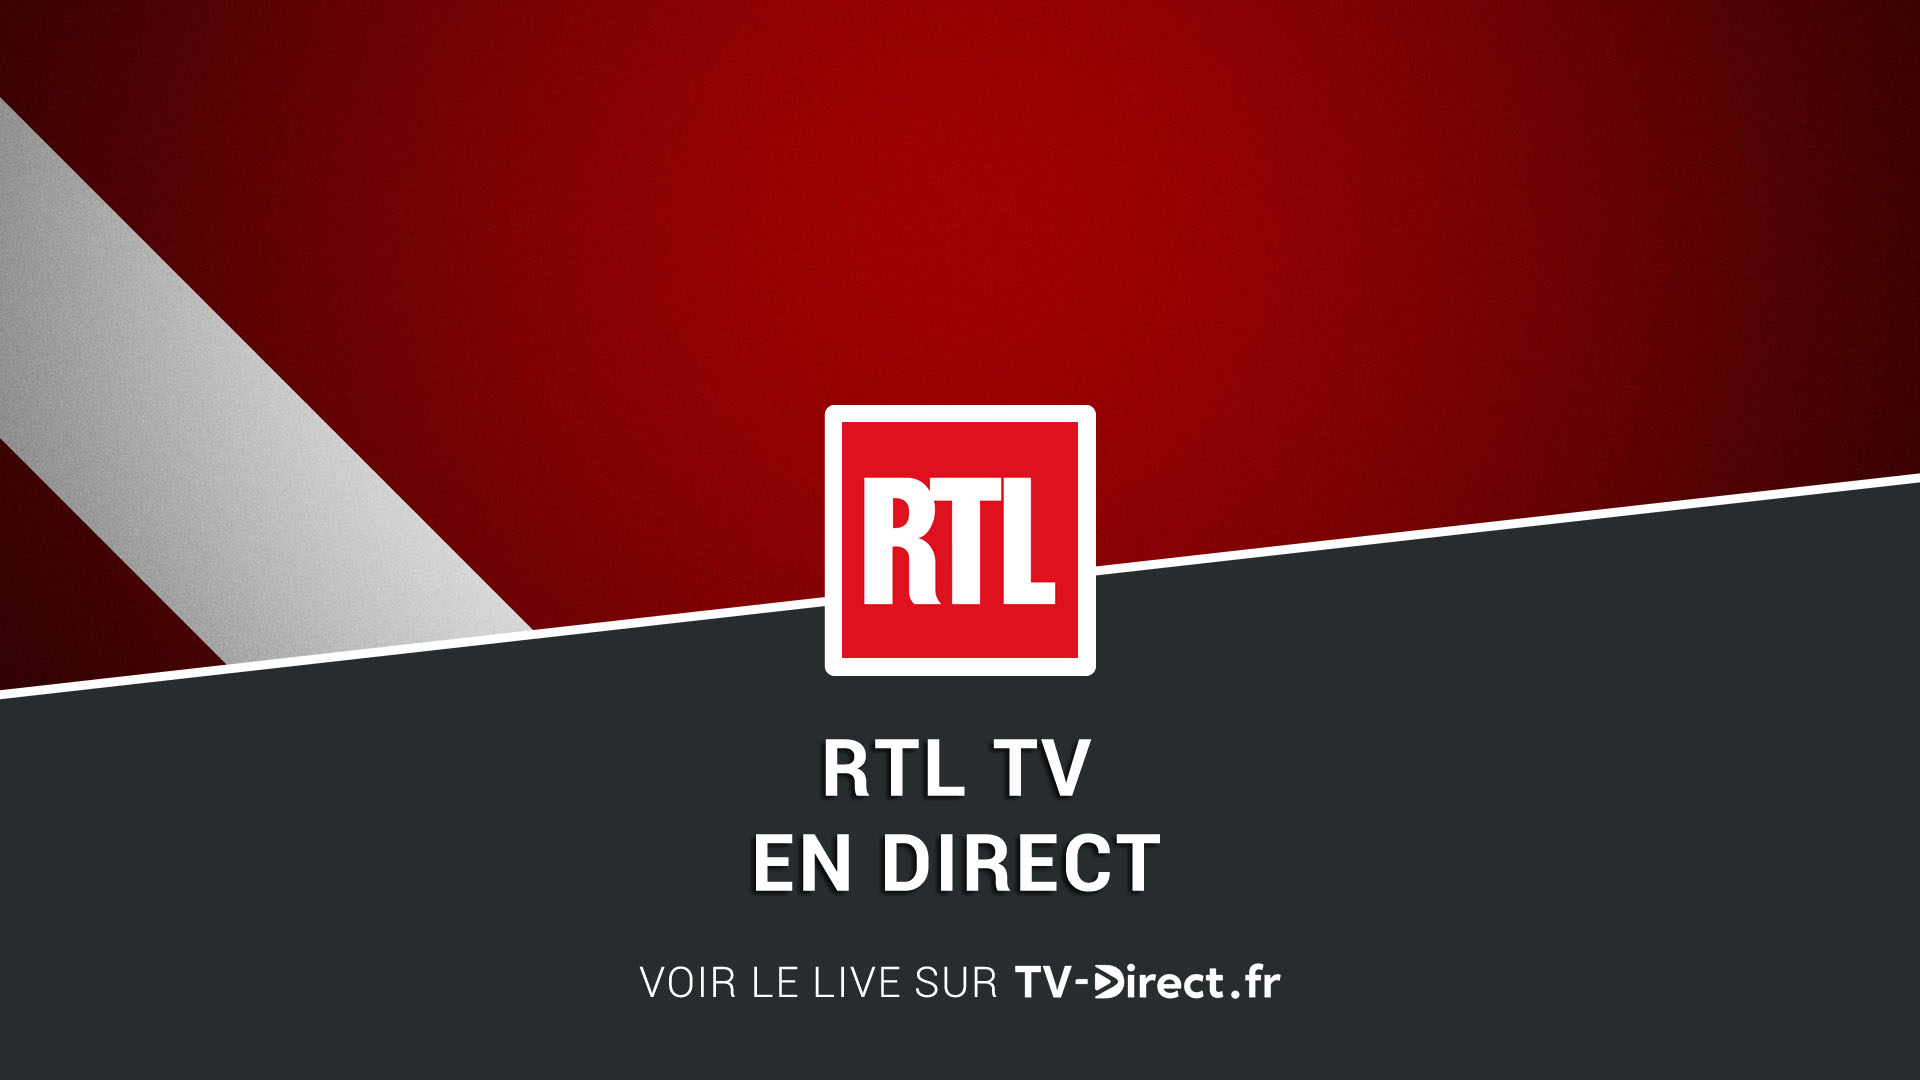 Rtl Tv Online